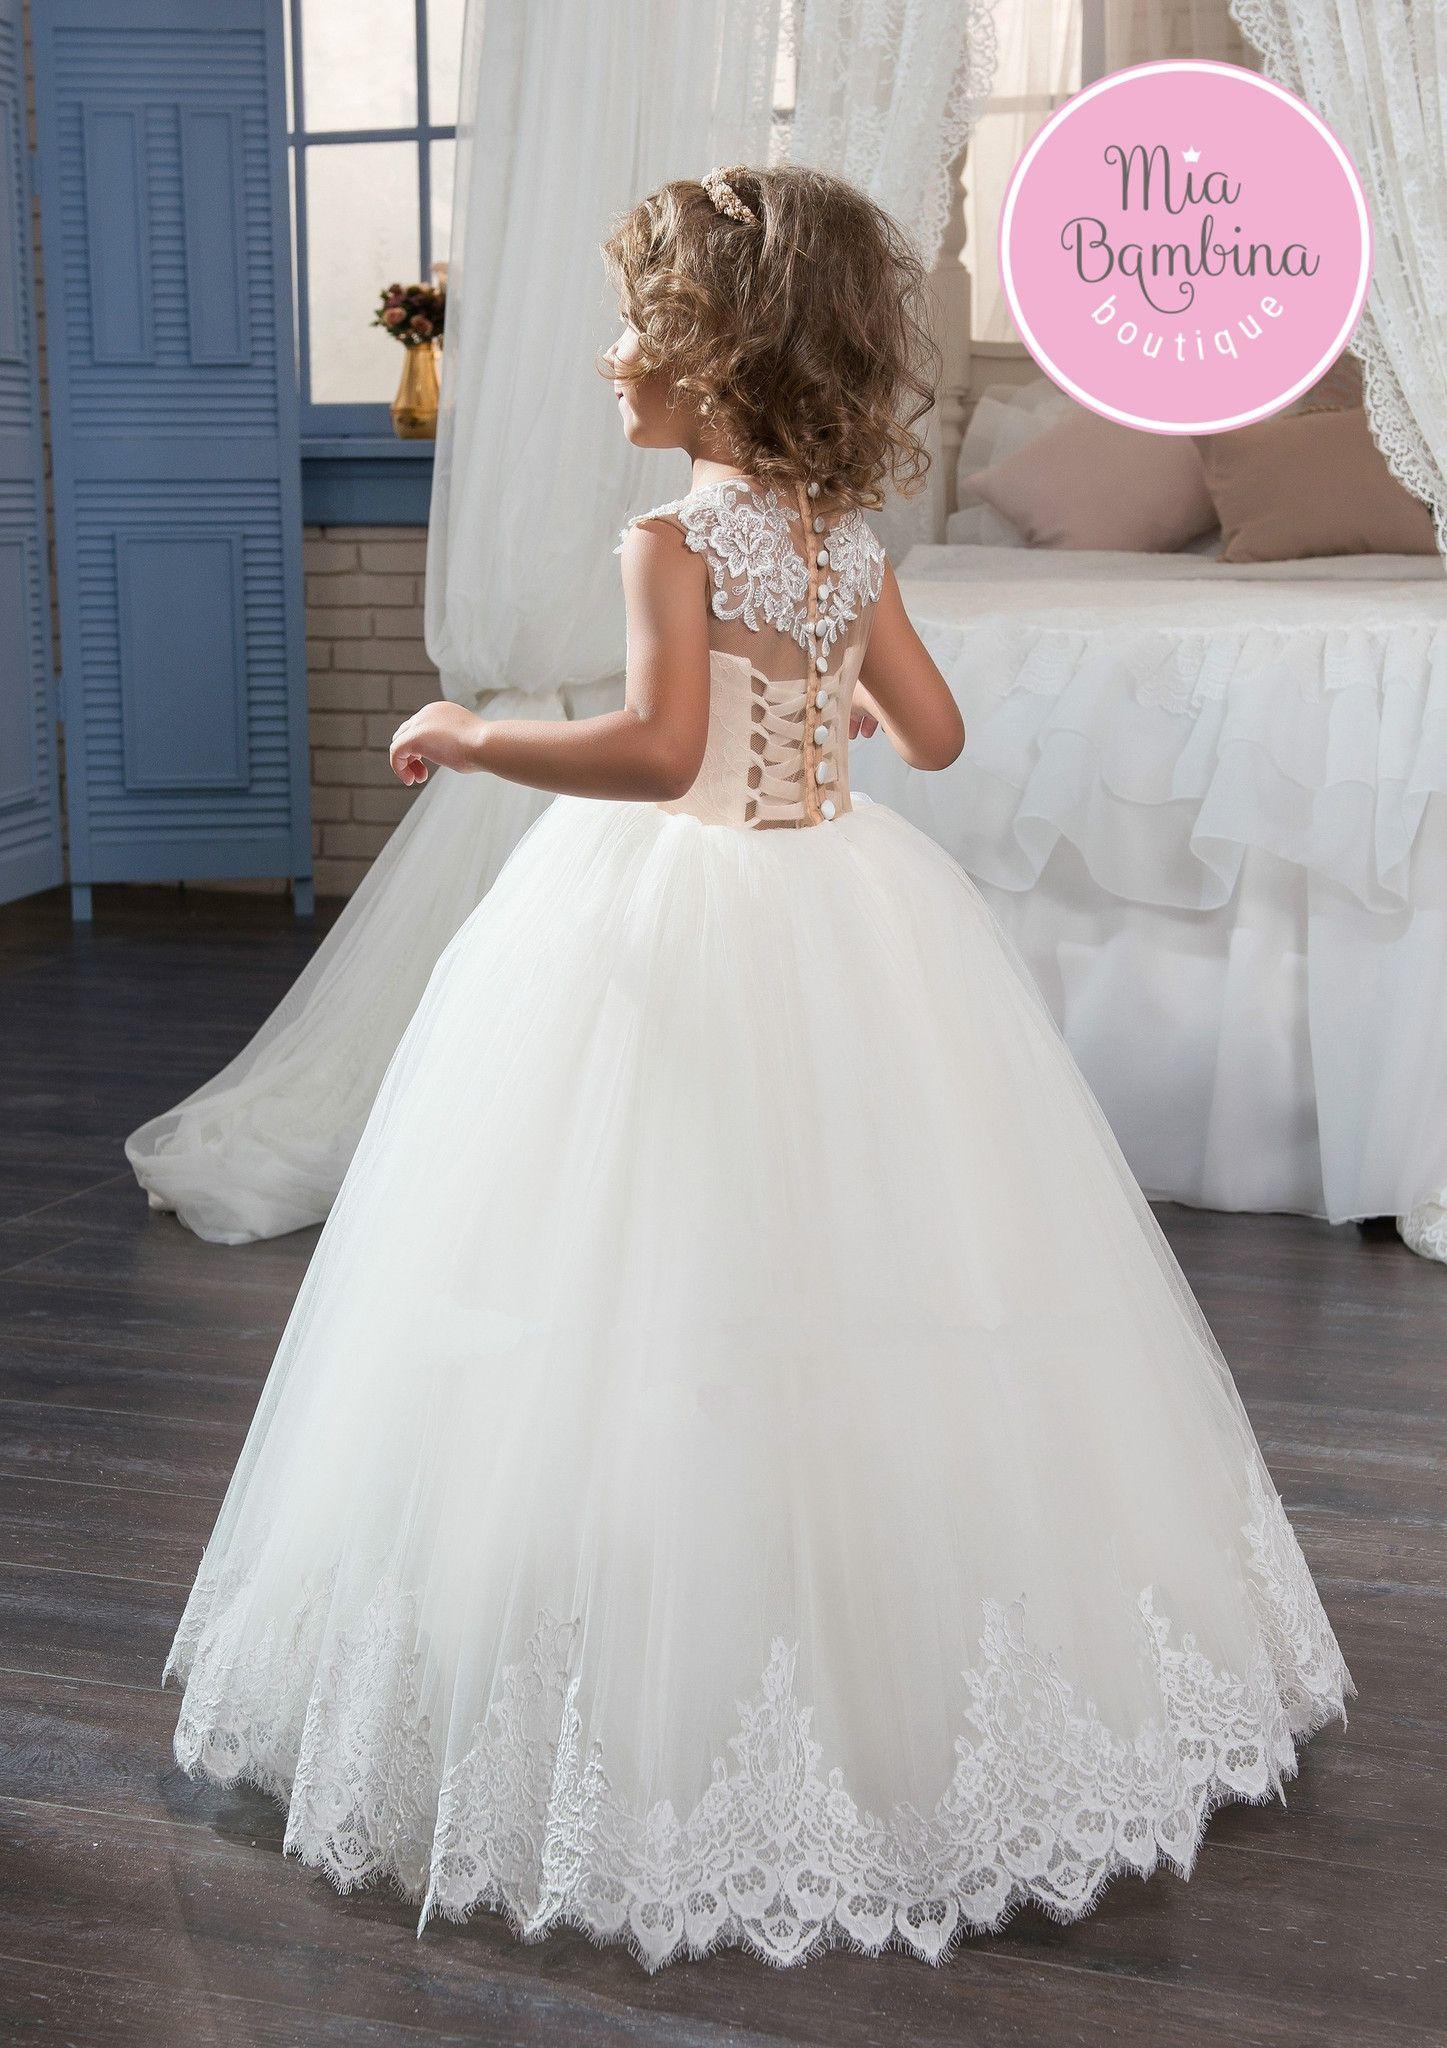 Pasadena | Wedding dress, Communion dresses and Lace applique